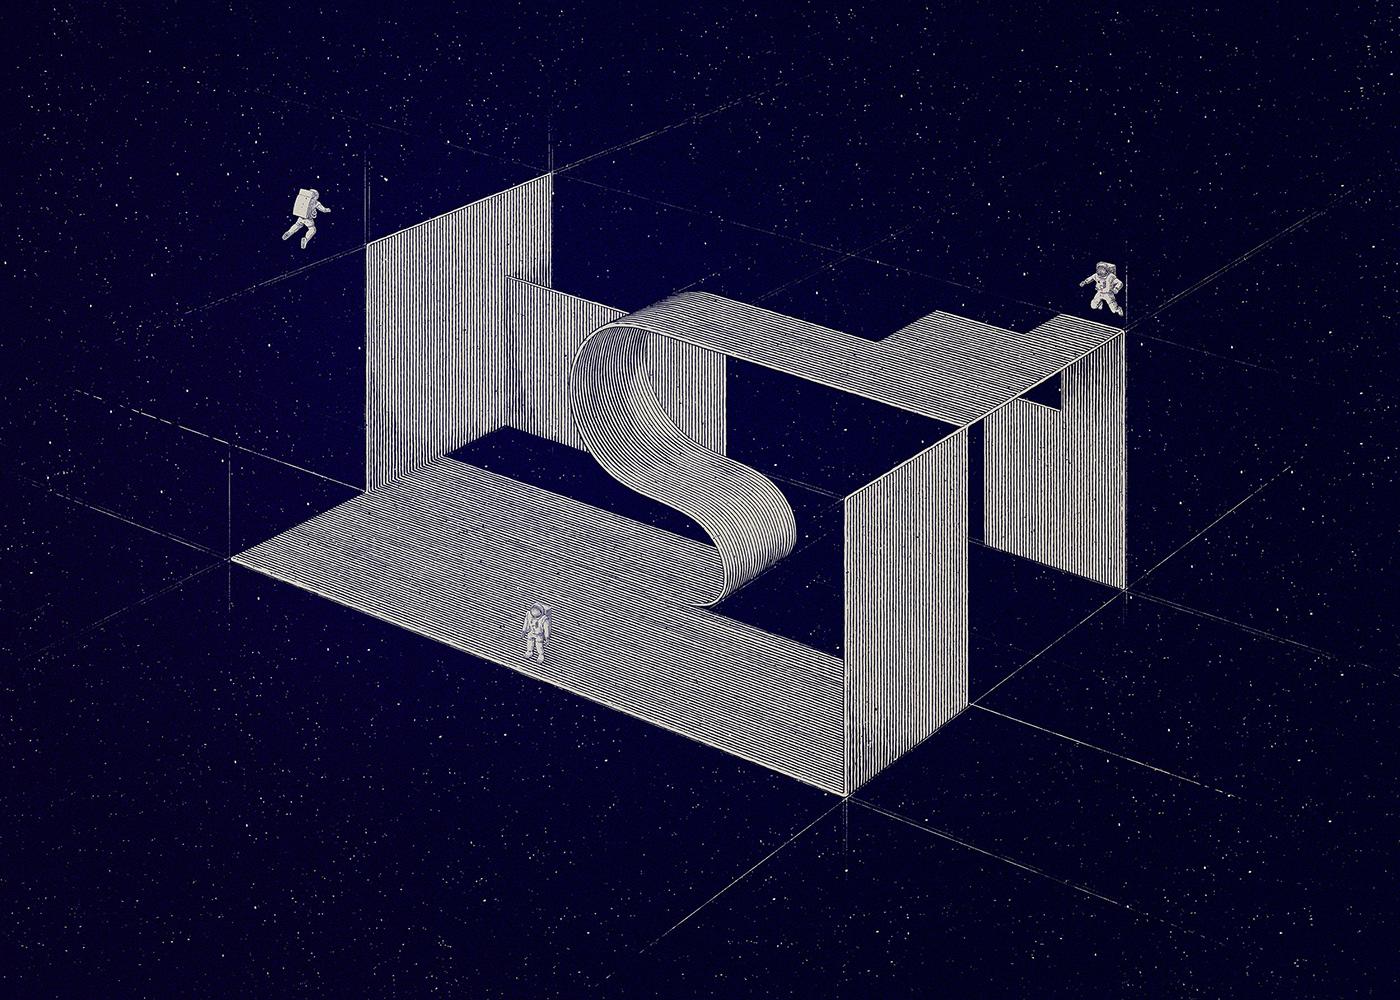 astronaut constructivism kobro screen print Screenprinting silk screen silver Space  spatial composition